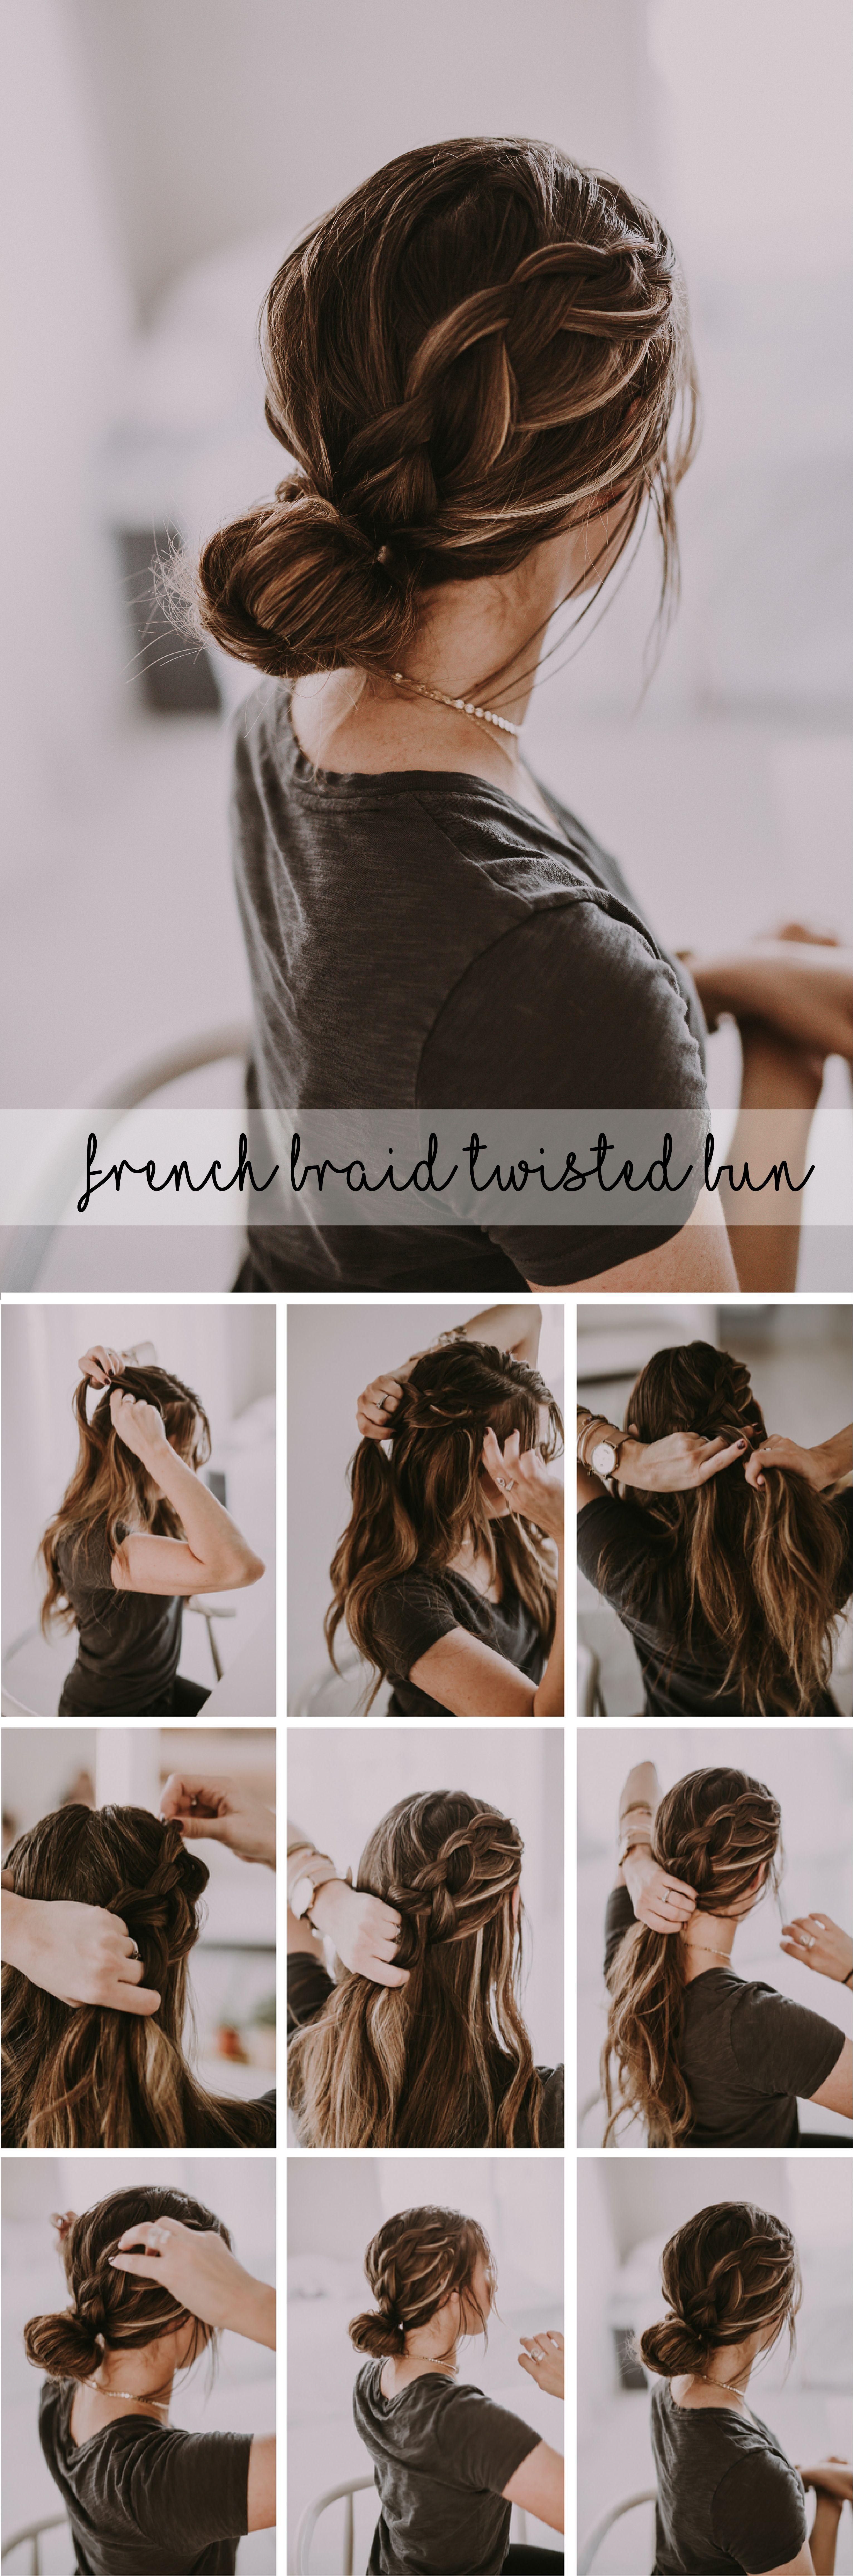 french braid bun tutorials | twist bun, beautiful hairstyles and